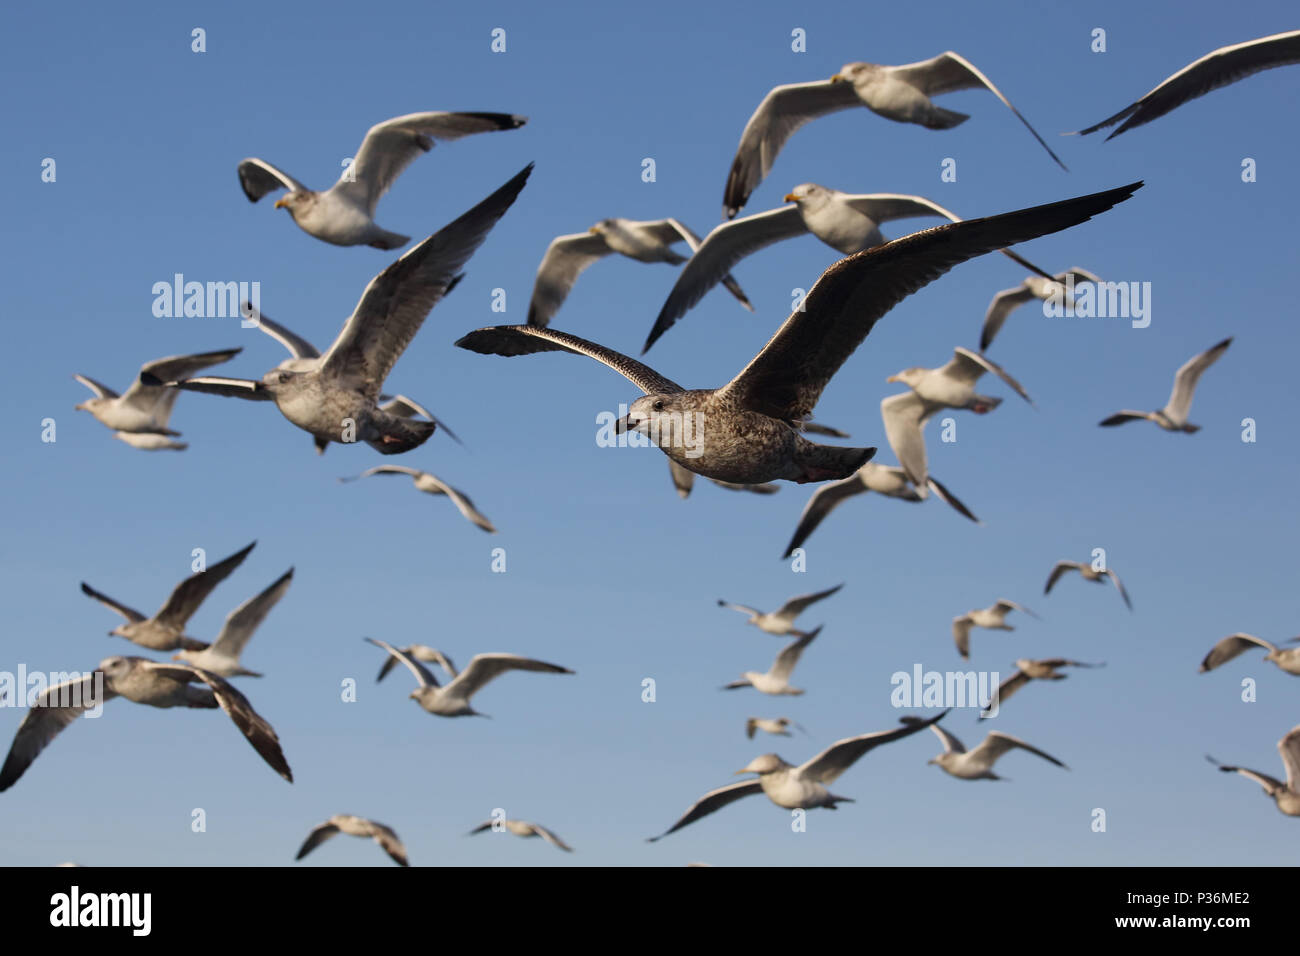 Wismar, Germany, Moewen in flight - Stock Image